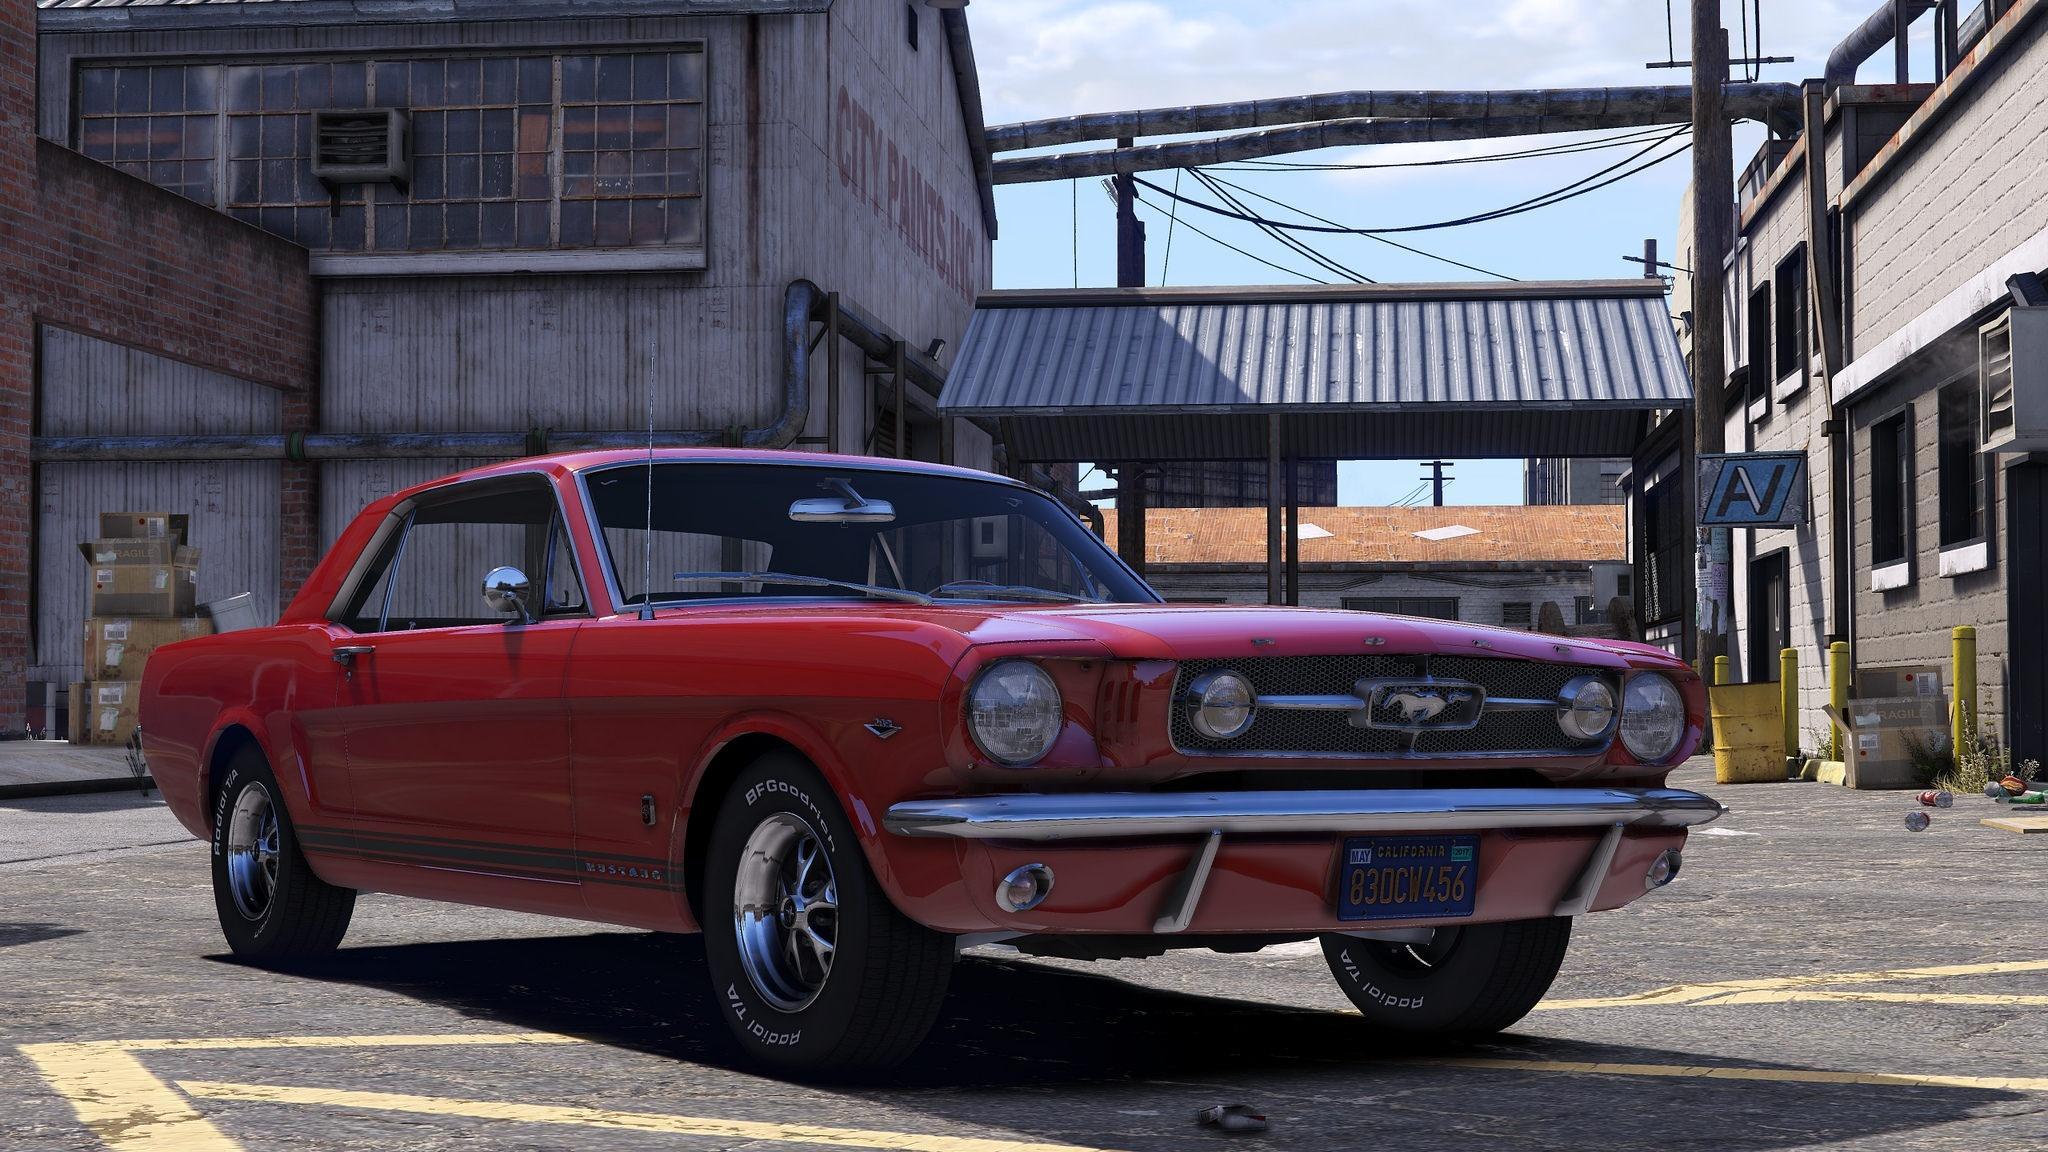 2015 Mustang Parts >> Mustang » GamesMods.net - FS17, CNC, FS15, ETS 2 mods